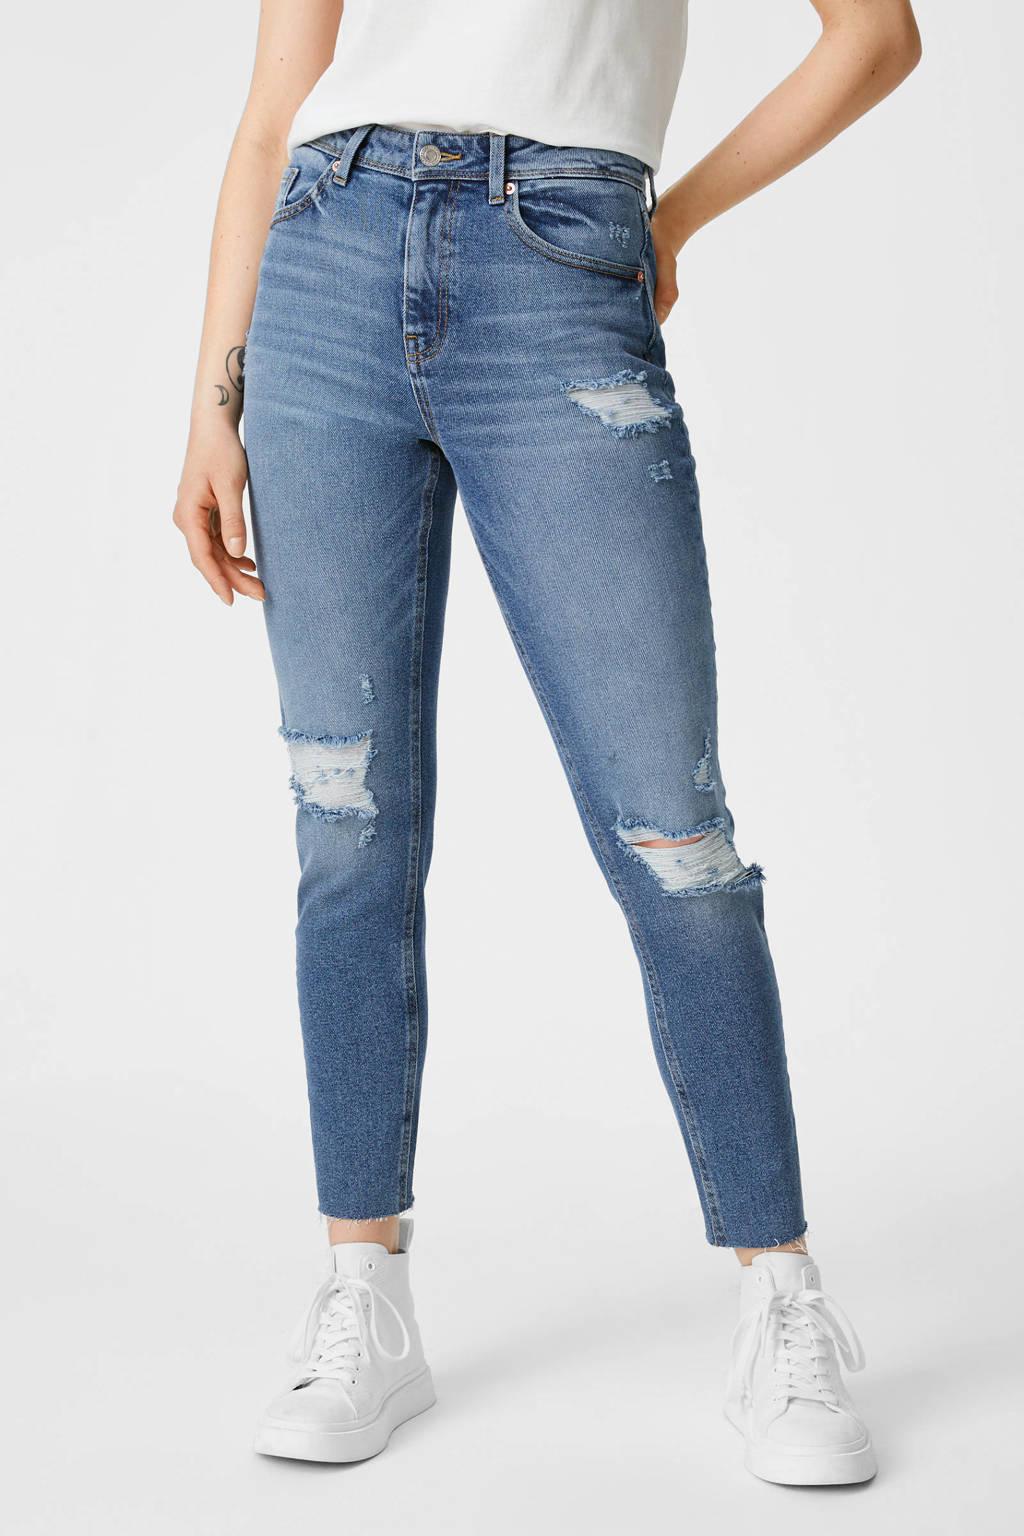 C&A Clockhouse high waist slim fit jeans blauw, Blauw